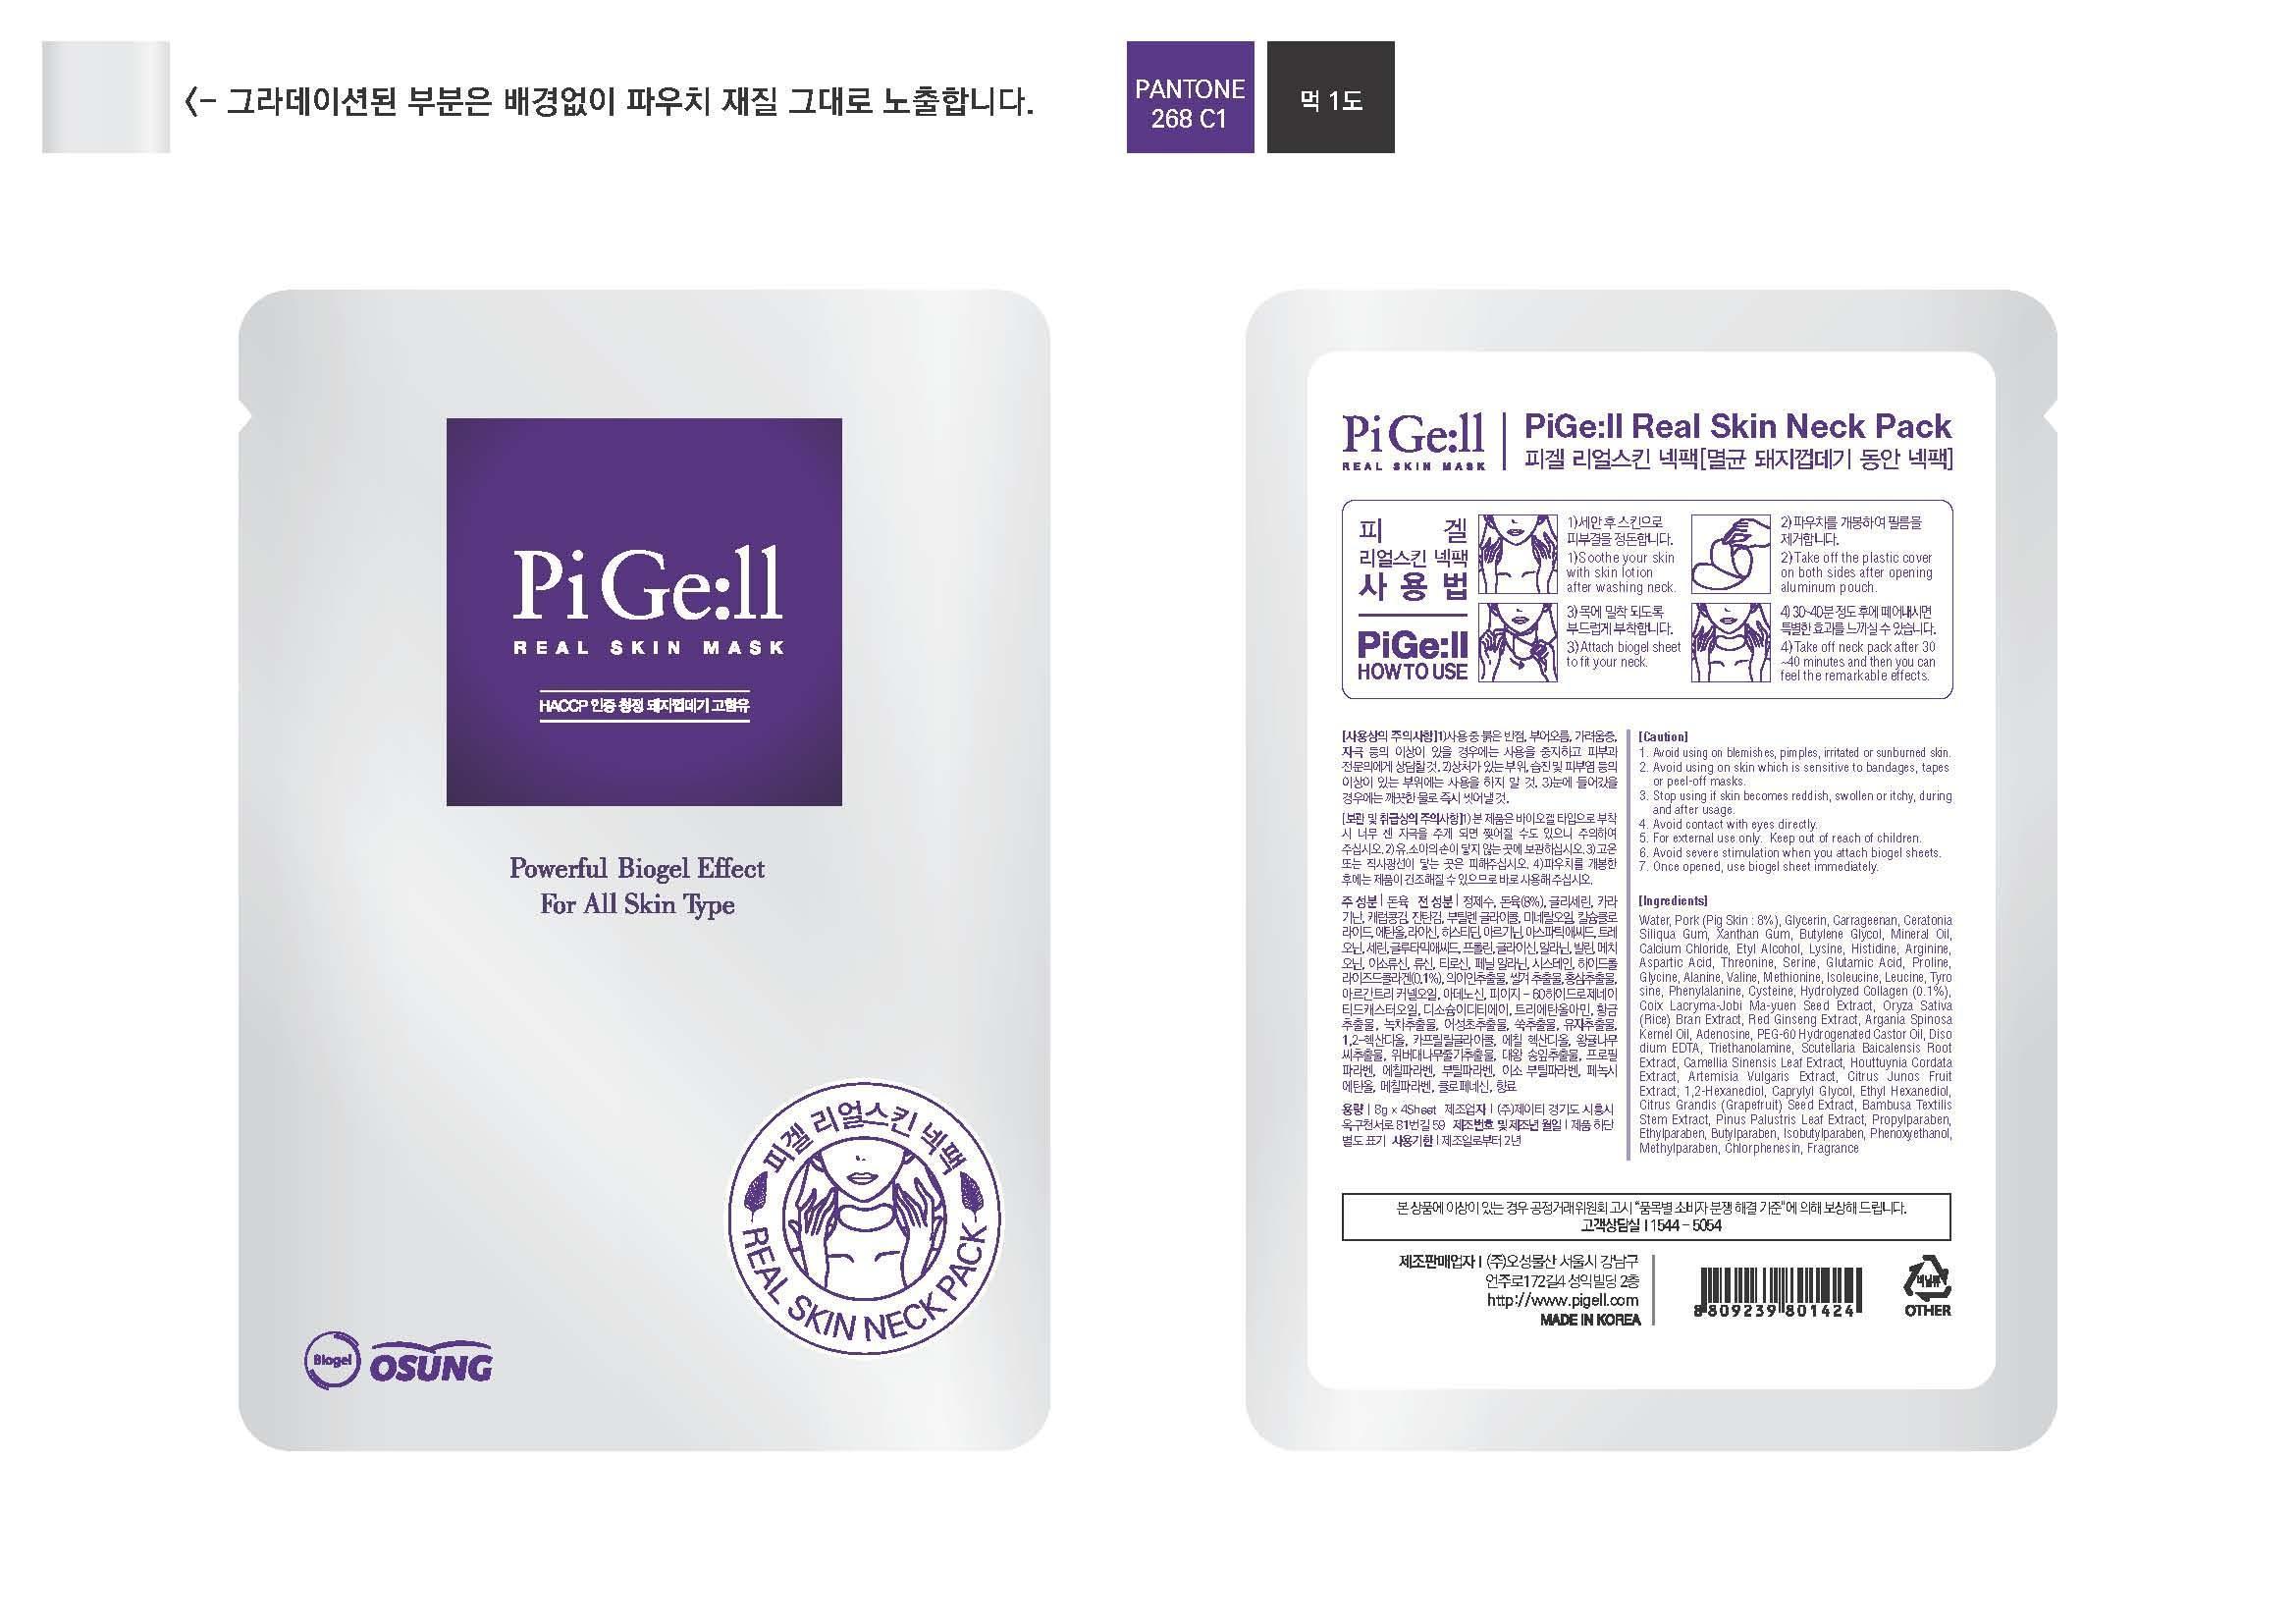 Pige Ll Real Skin Neck Pack (Sus Scrofa Skin) Liquid [Osung Co., Ltd]